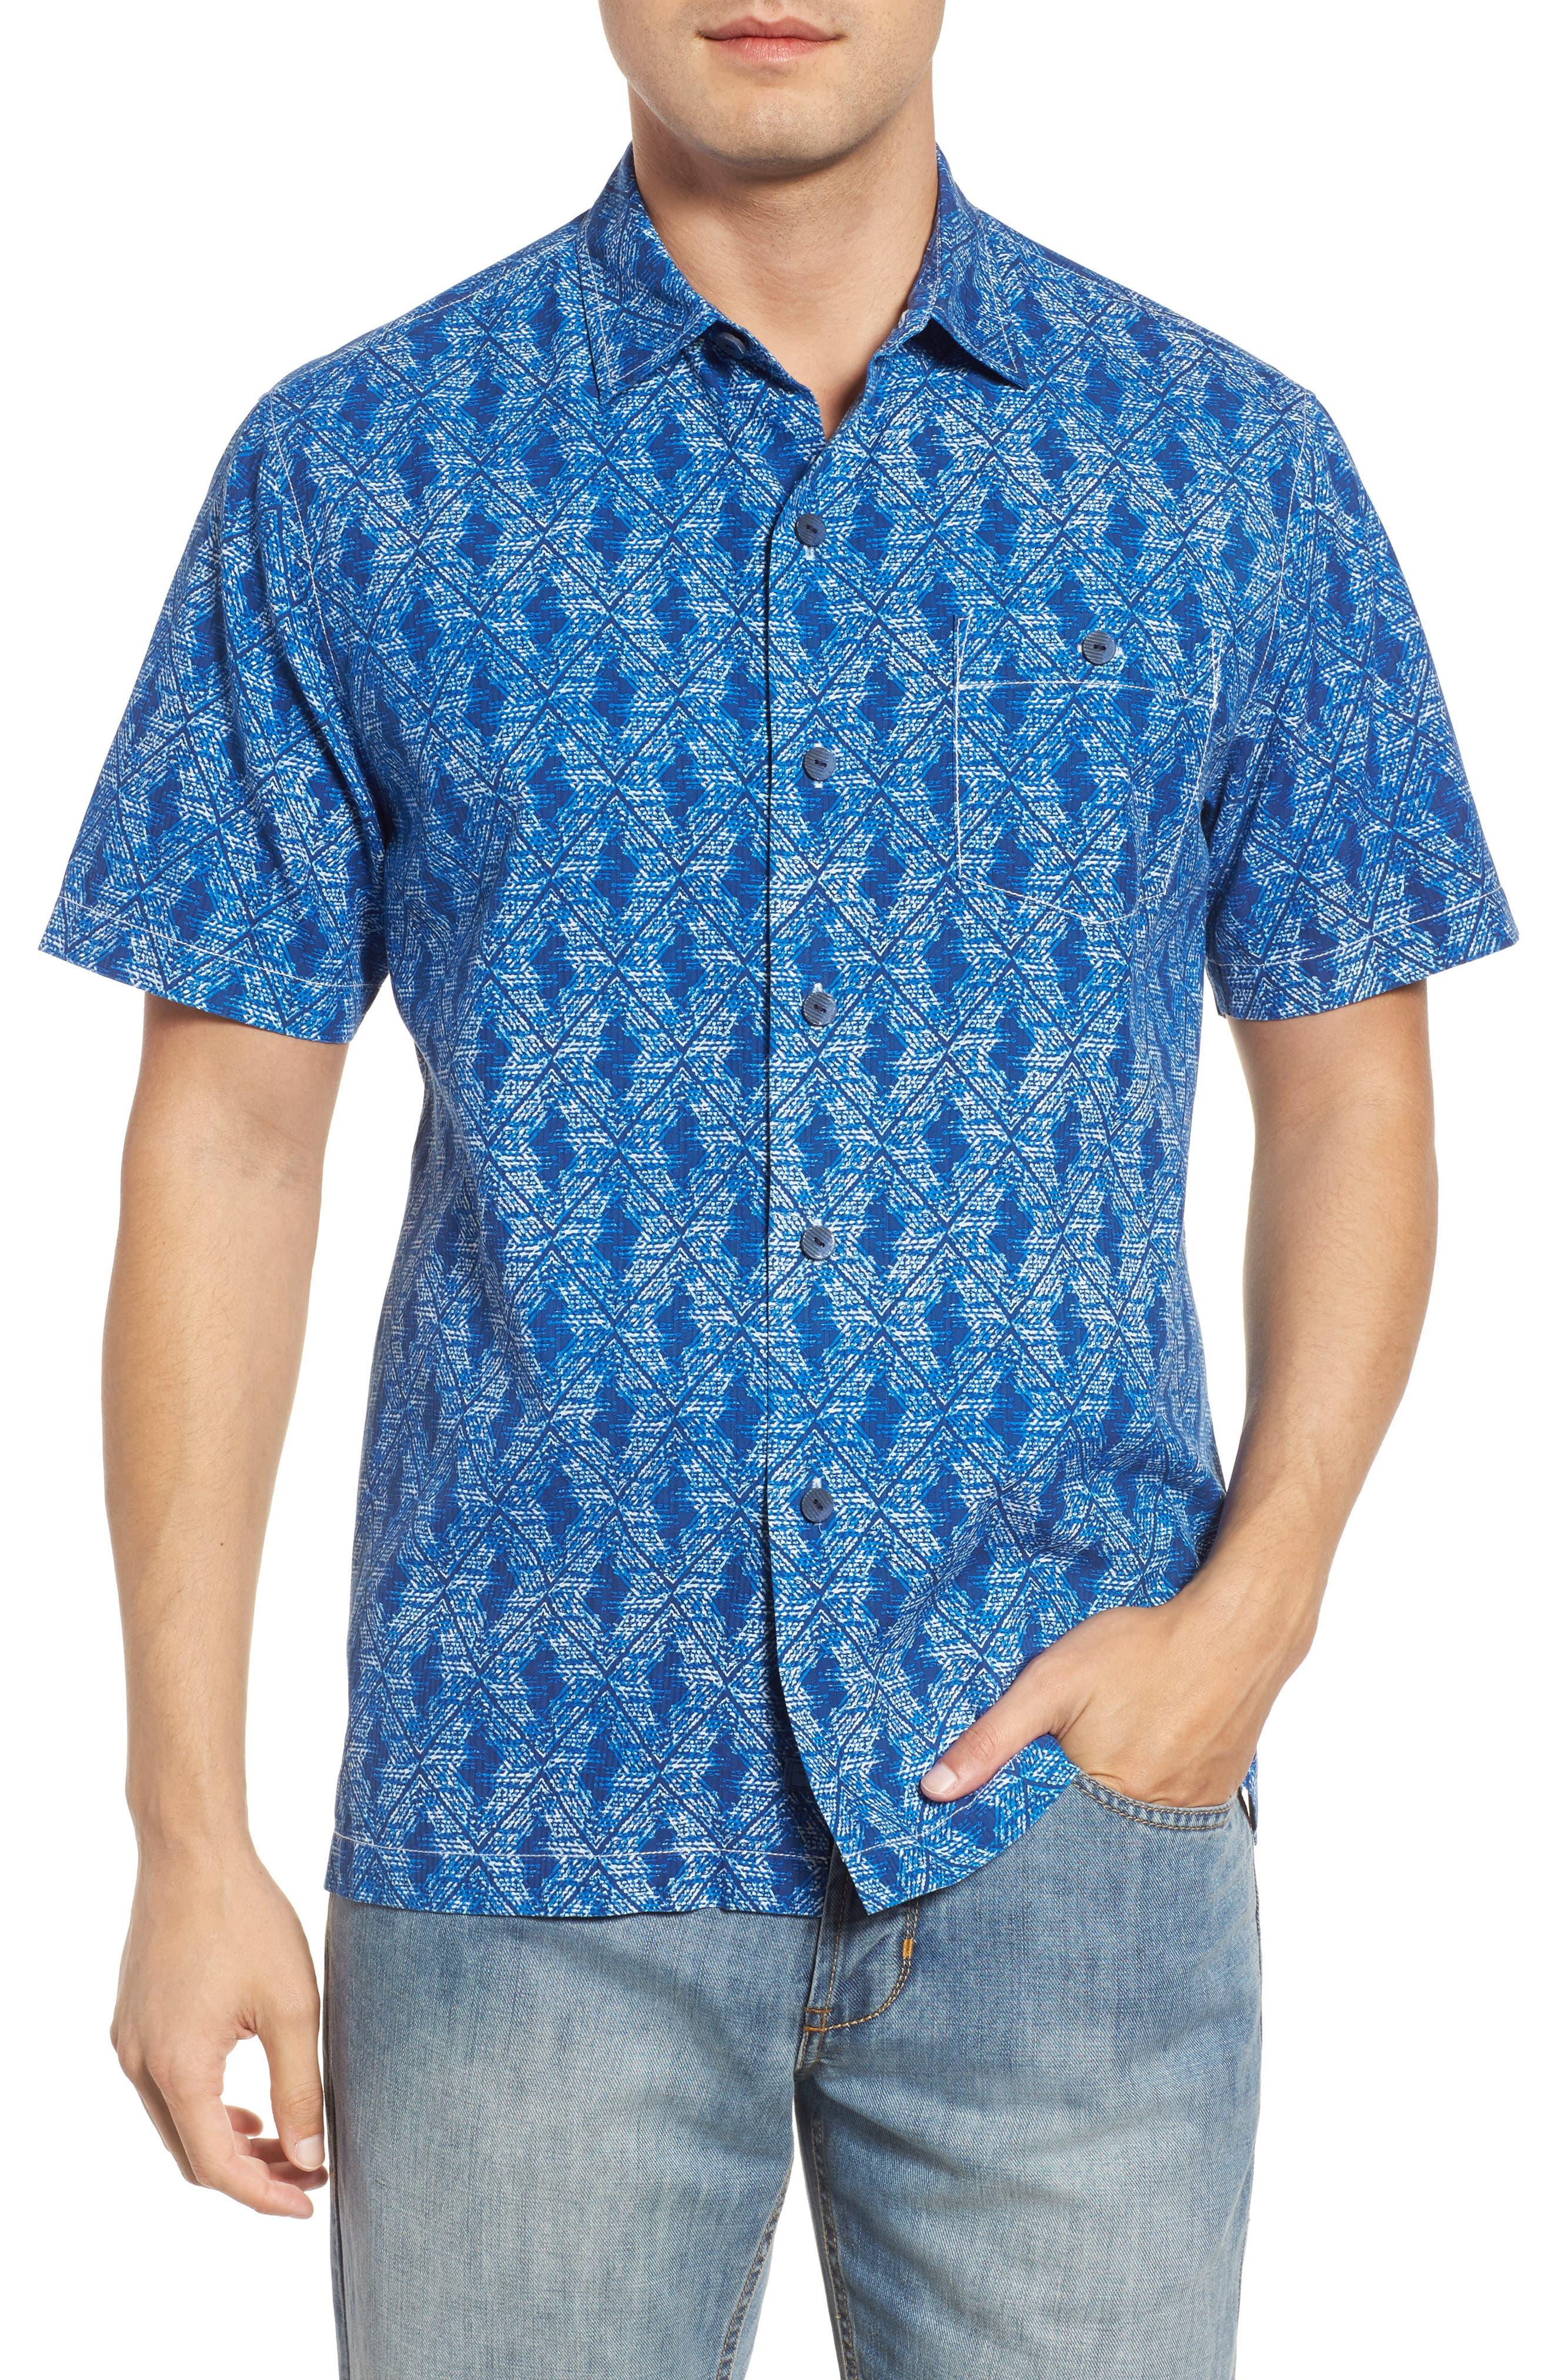 Del Ray Diamond Sport Shirt,                         Main,                         color, Kingdom Blue